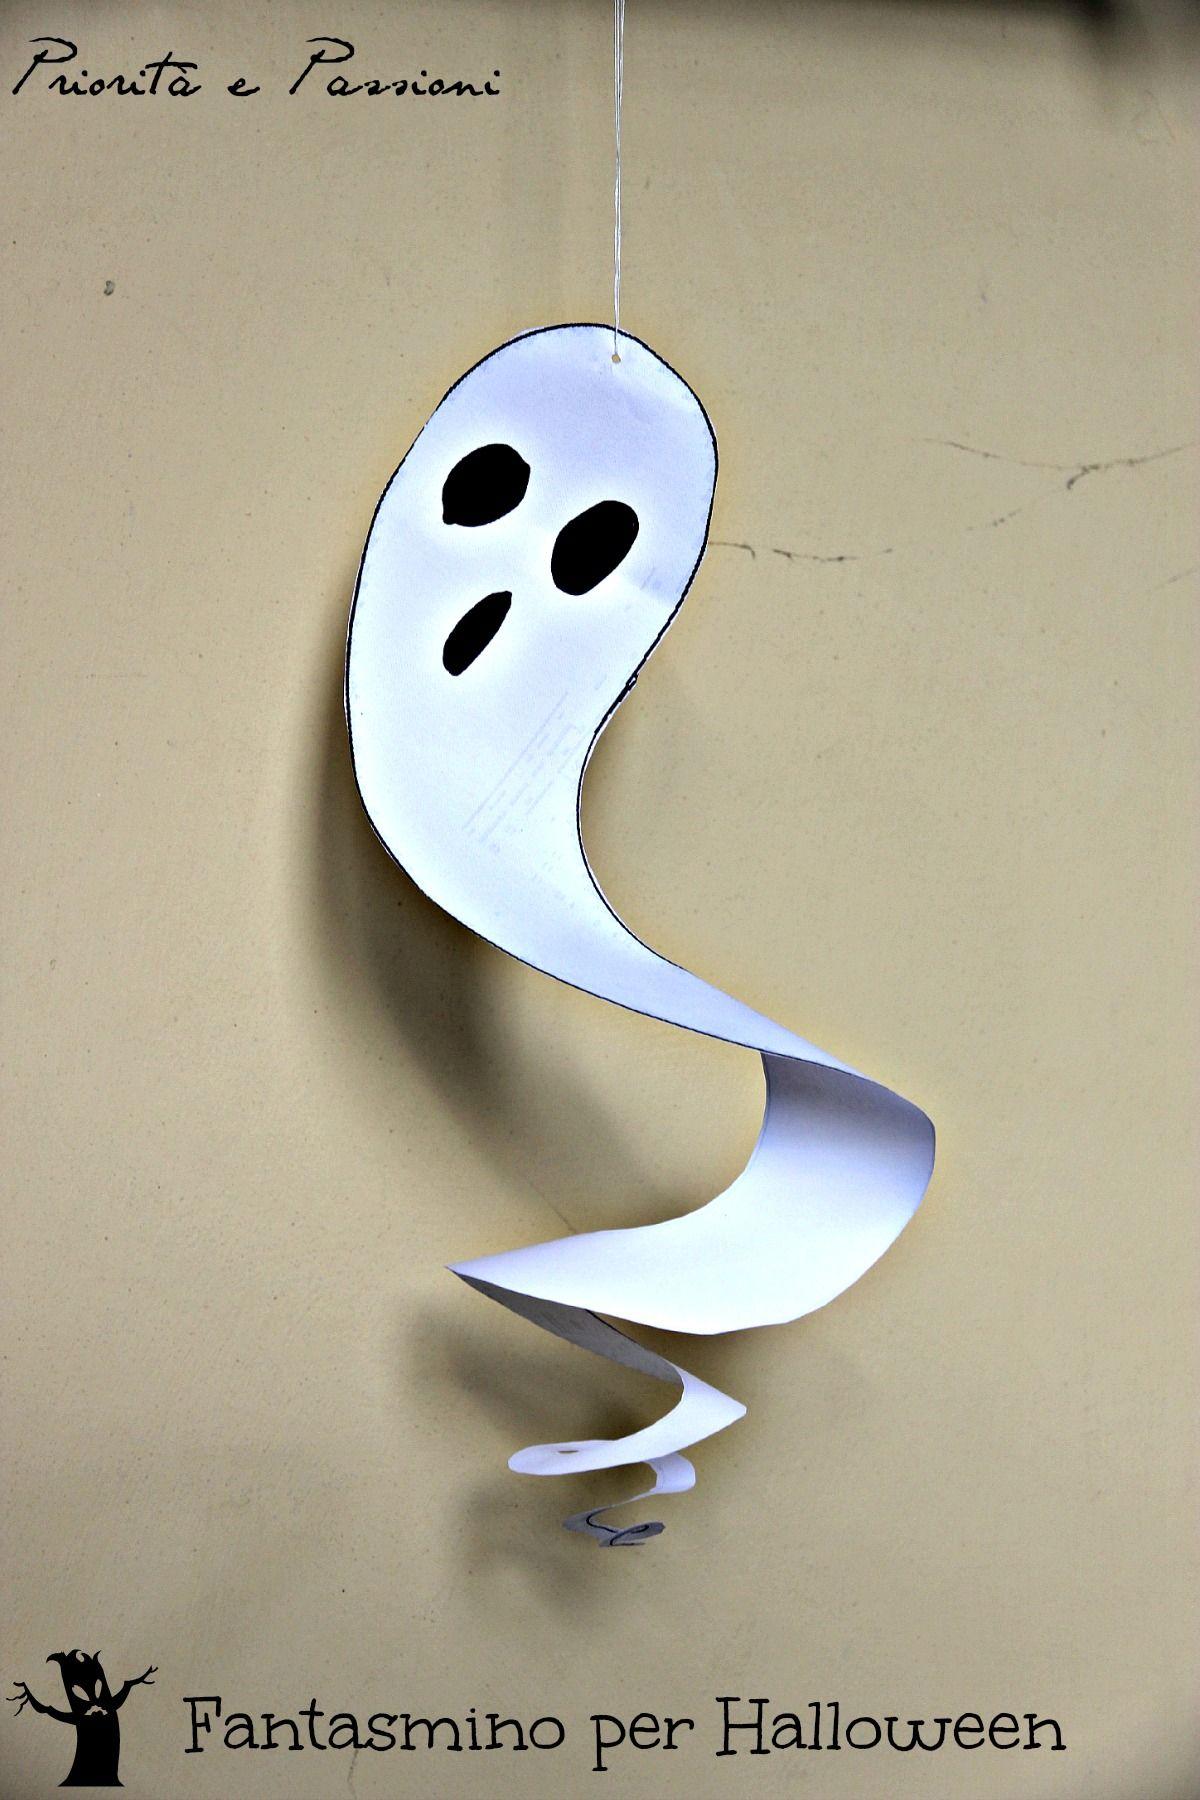 fantasmi di carta http://prioritaepassioni.blogspot.it/2014/10/ancora-preperativi-per-halloween.html